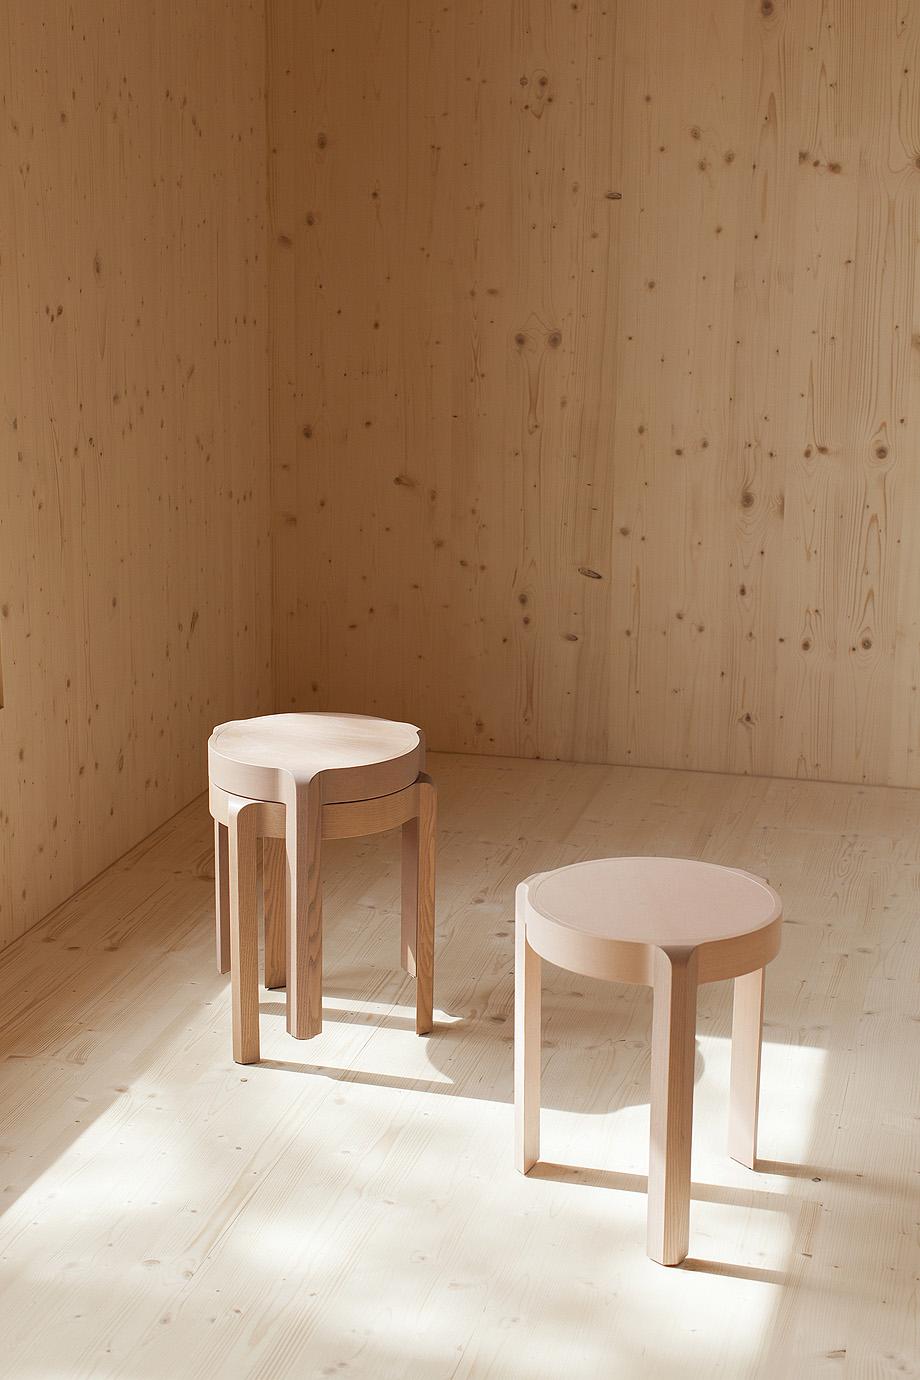 casa pasiva de atelier ordinaire - foto julien renault (15)